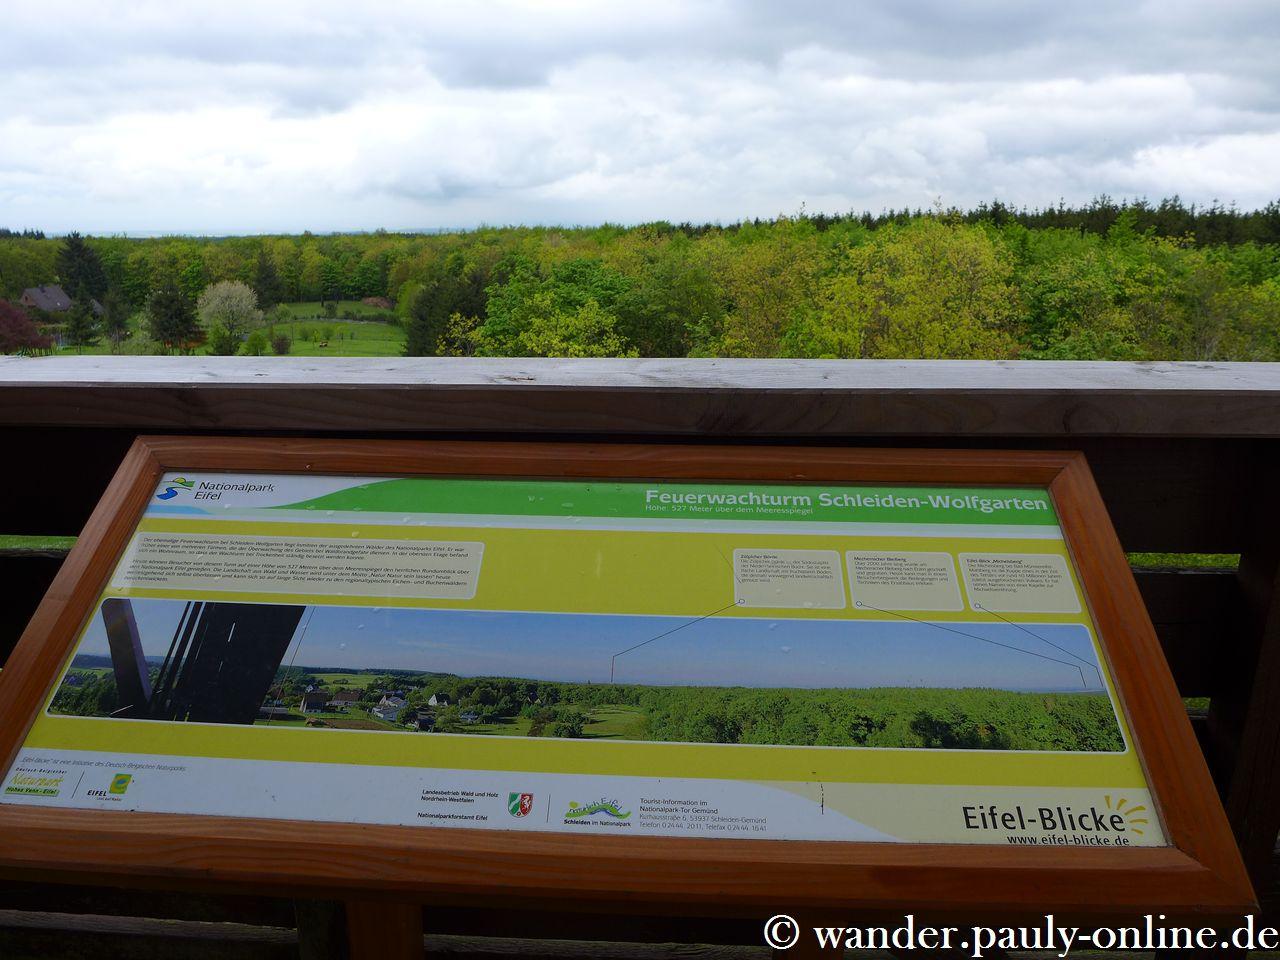 Nationalpark Eifel T7 - Eifel-Blick Feuerwachturm